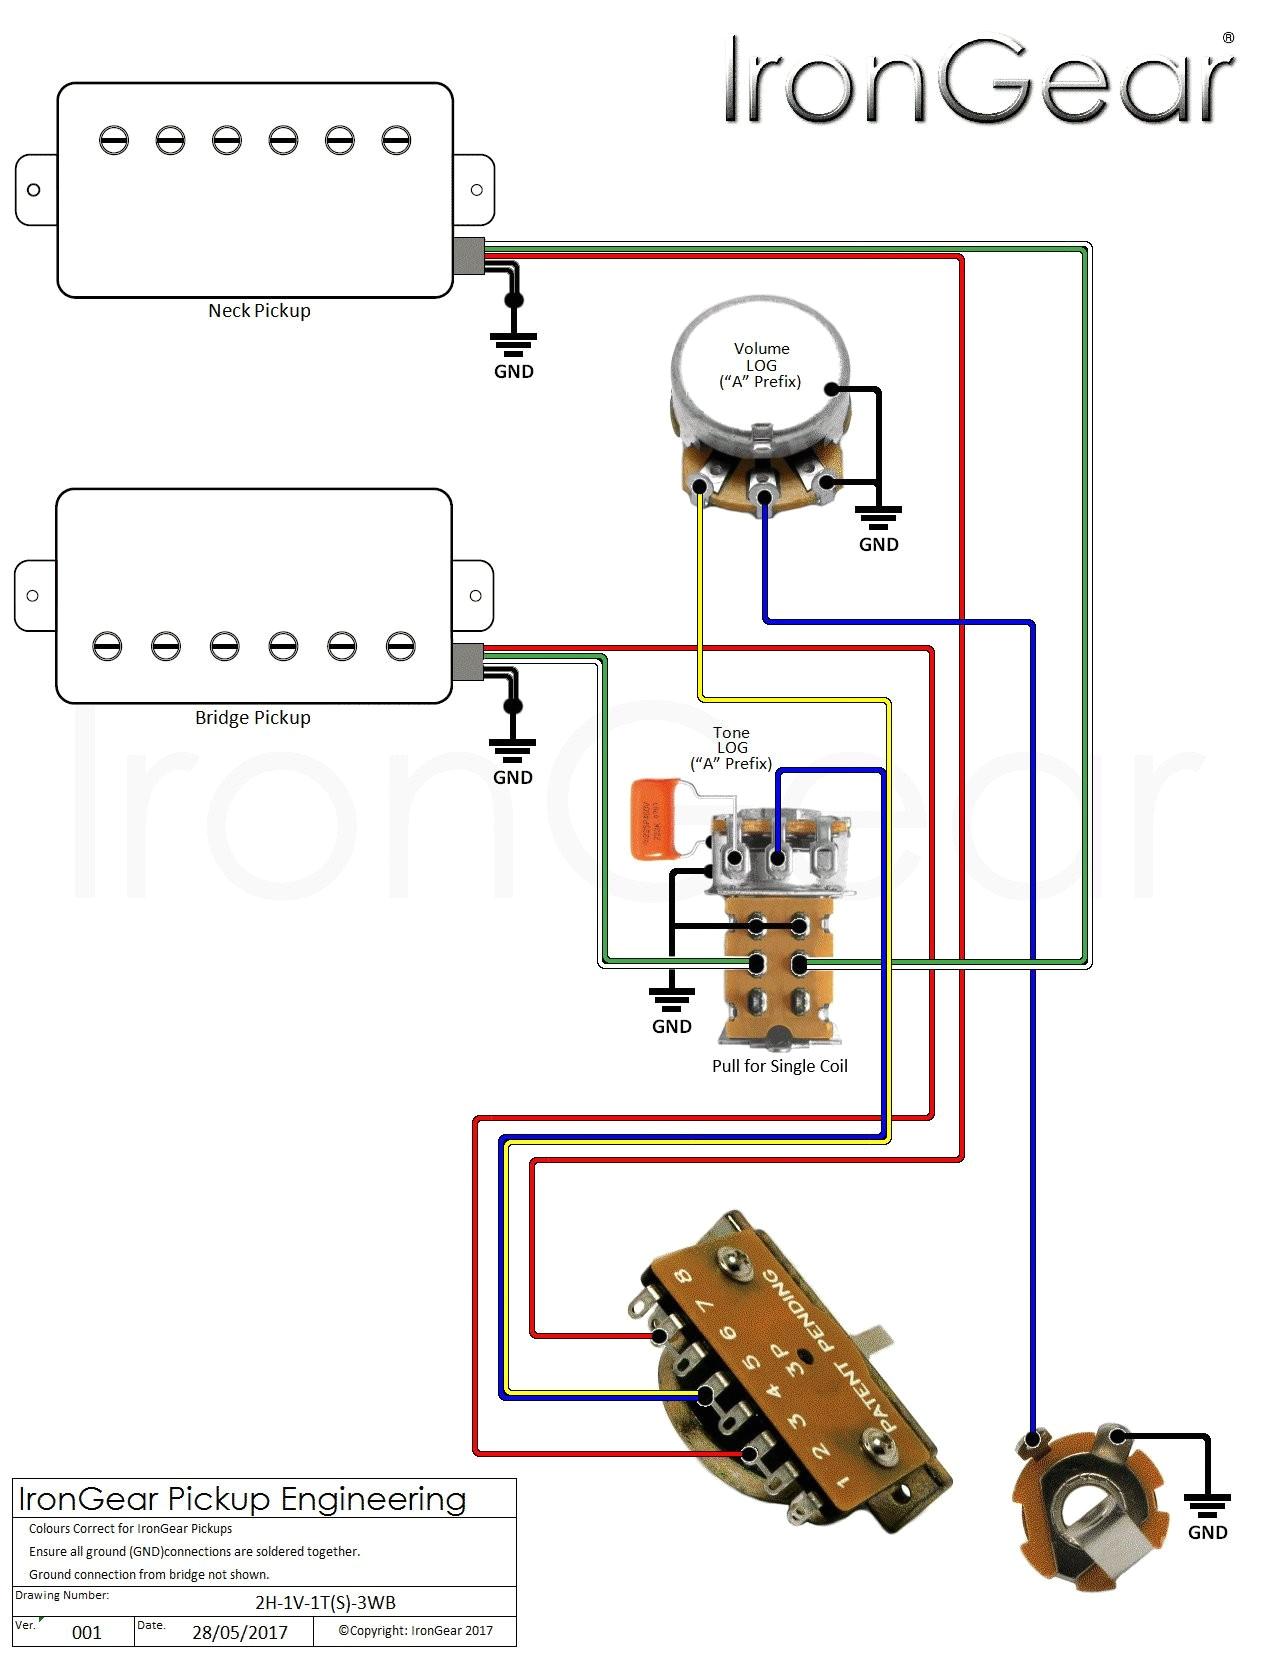 emg bass pickups wiring diagram awesome active guitar wiring diagram best wiring diagram active pickups